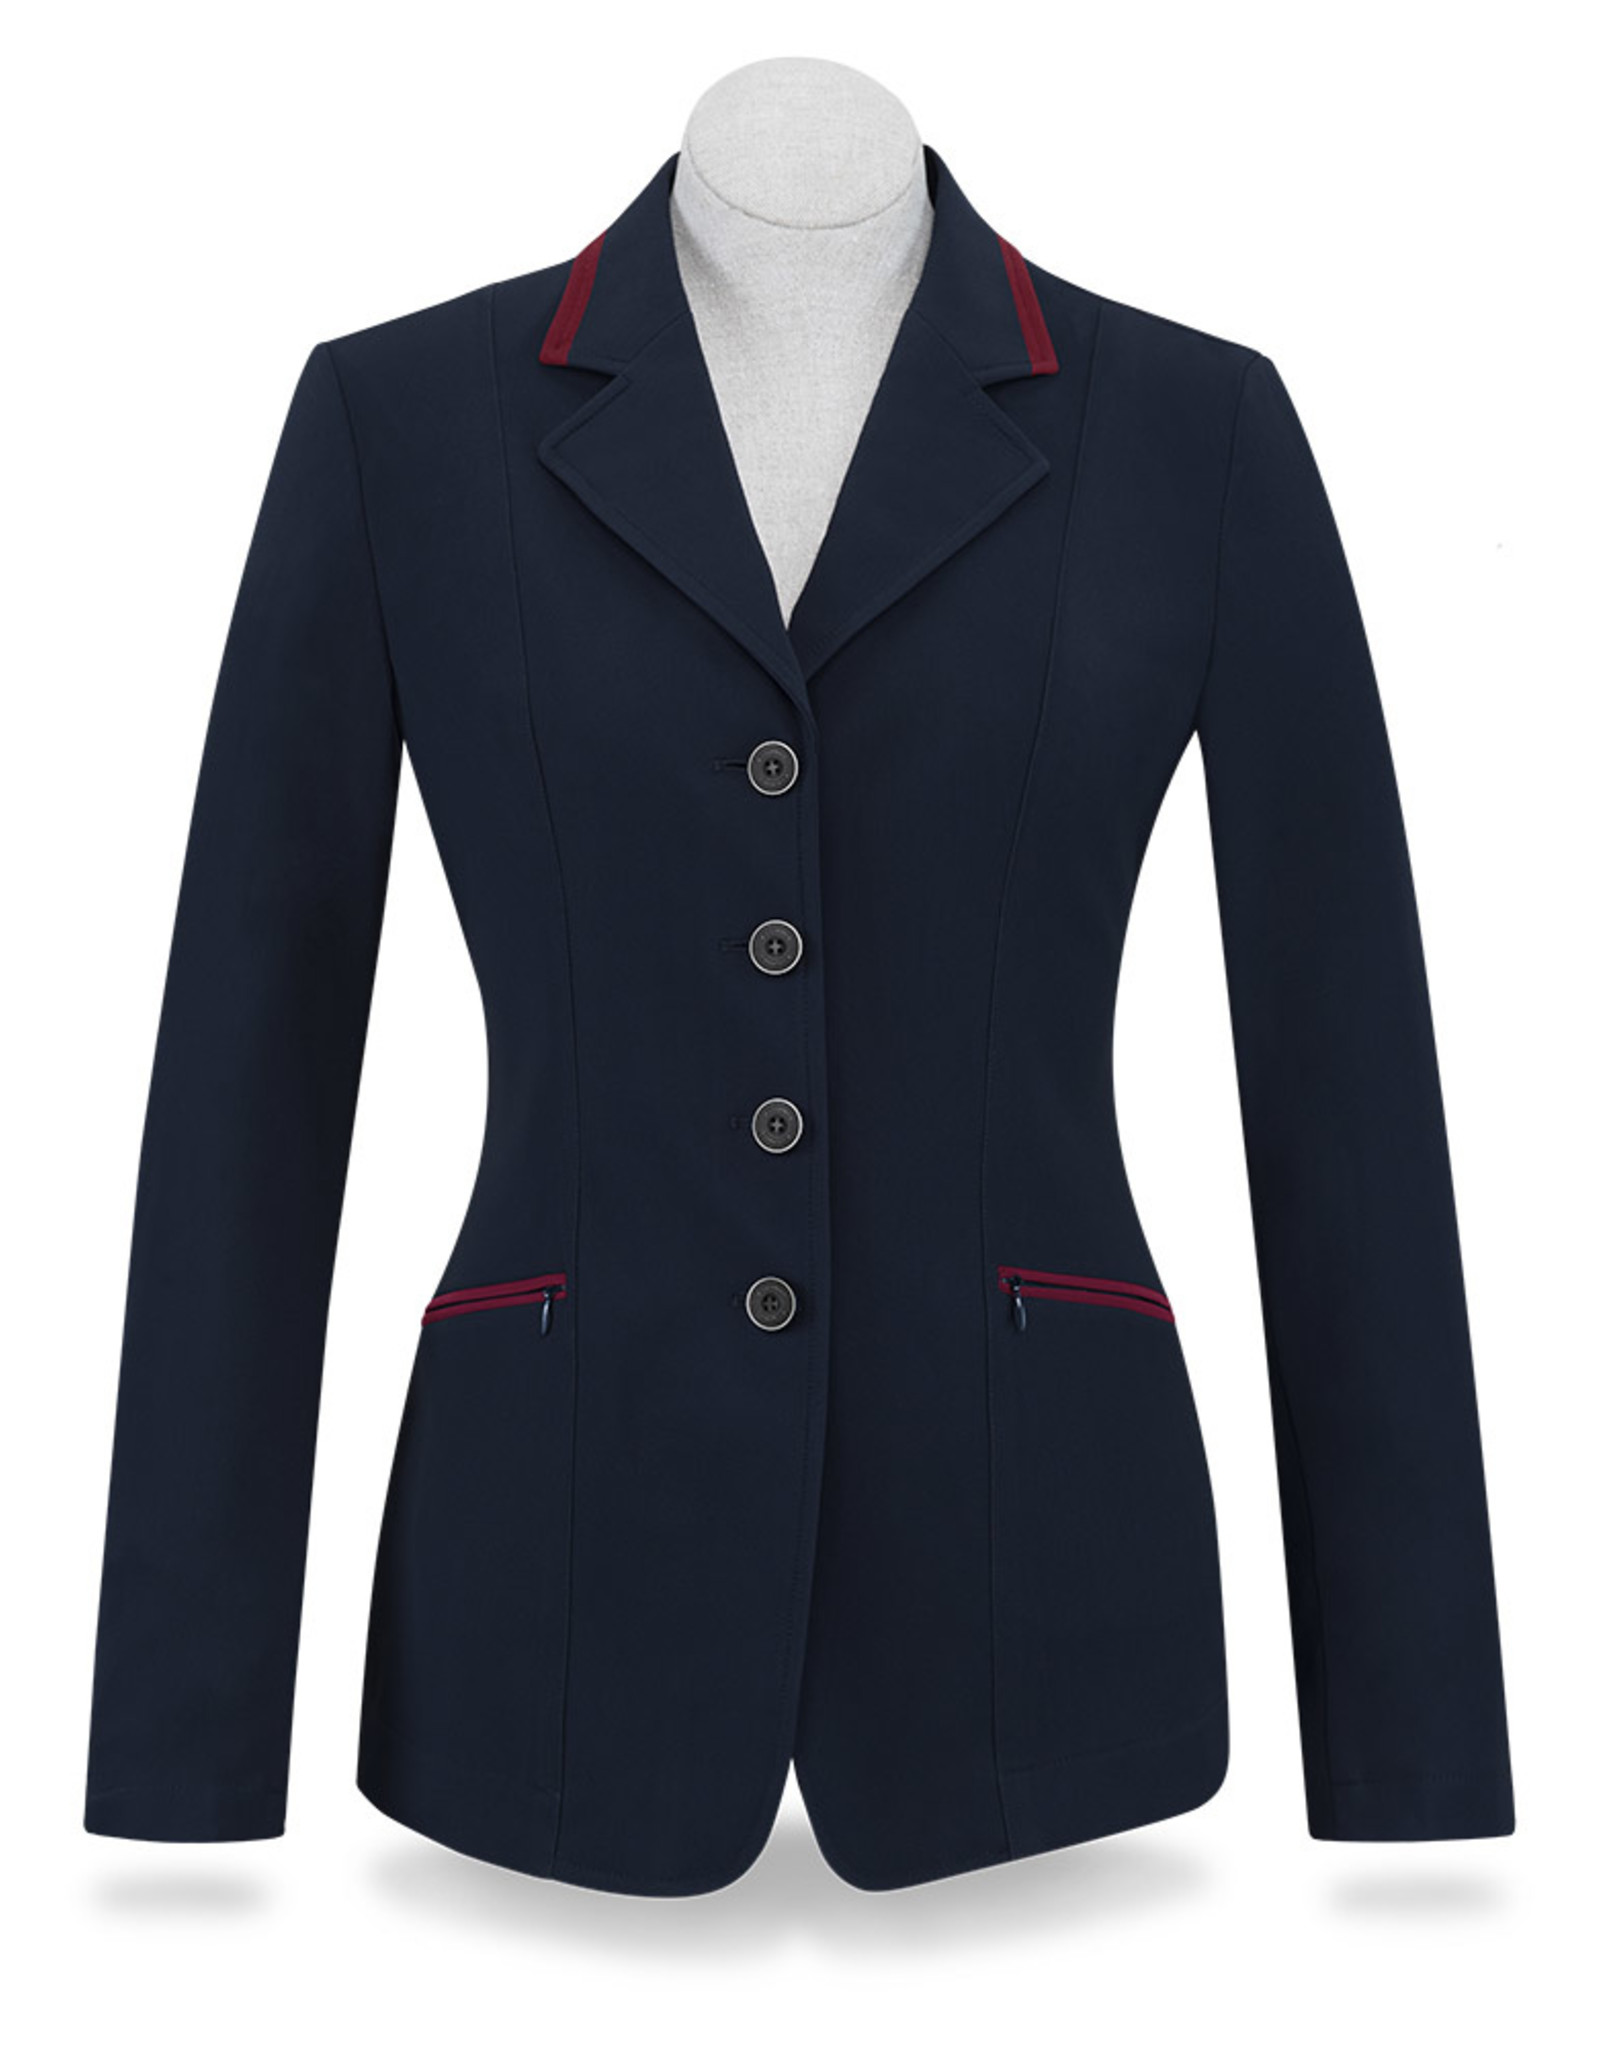 RJ Classics  Ladies' Victory Coat 2 Tone